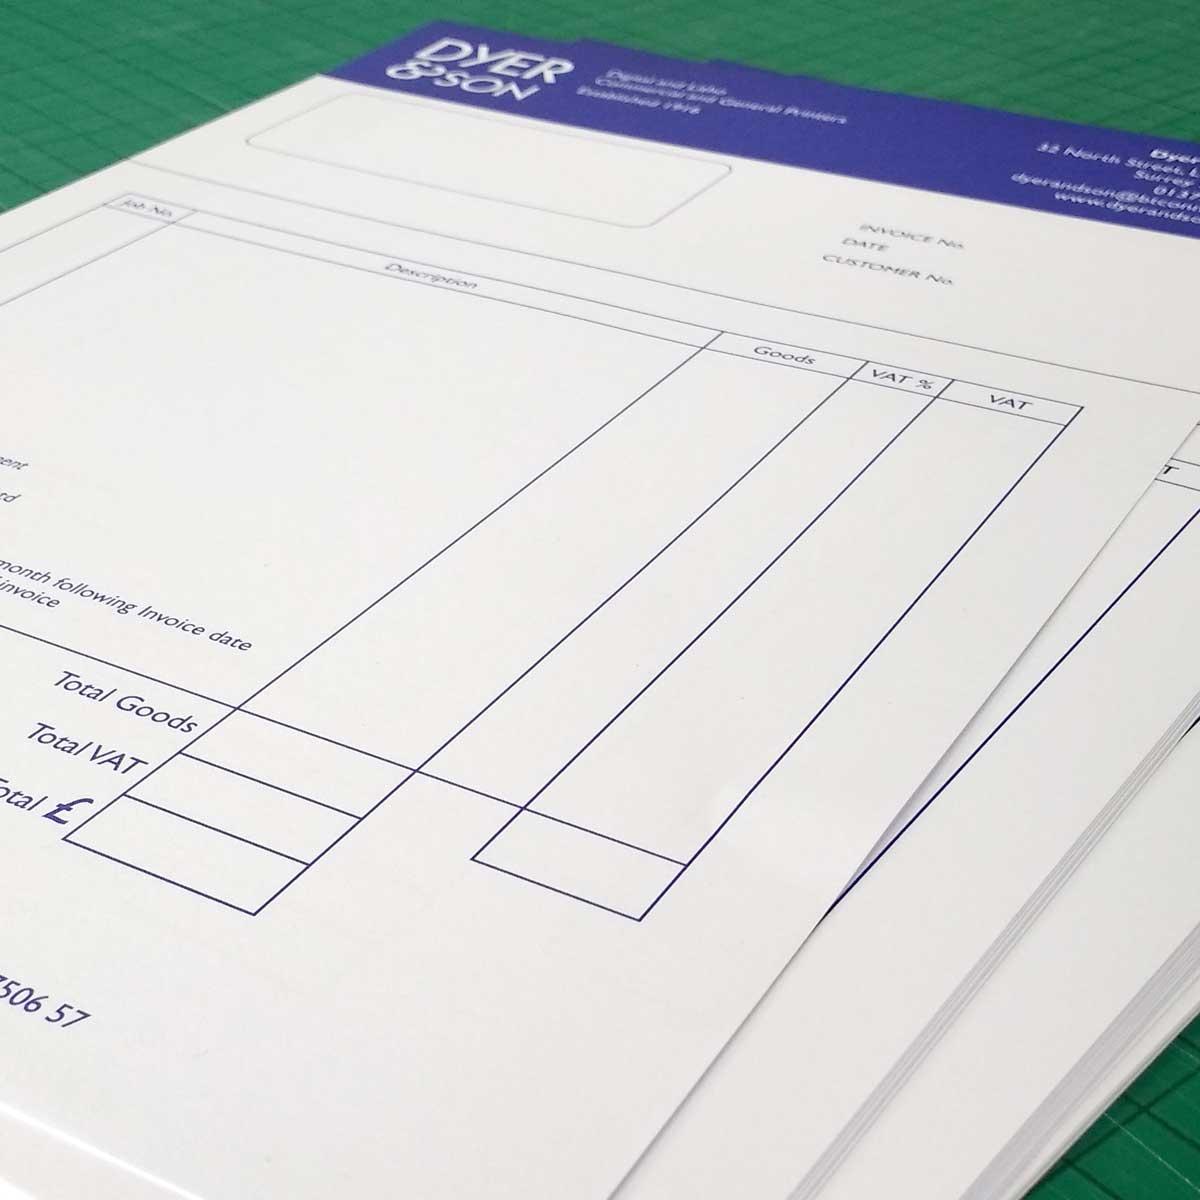 Invoice Image